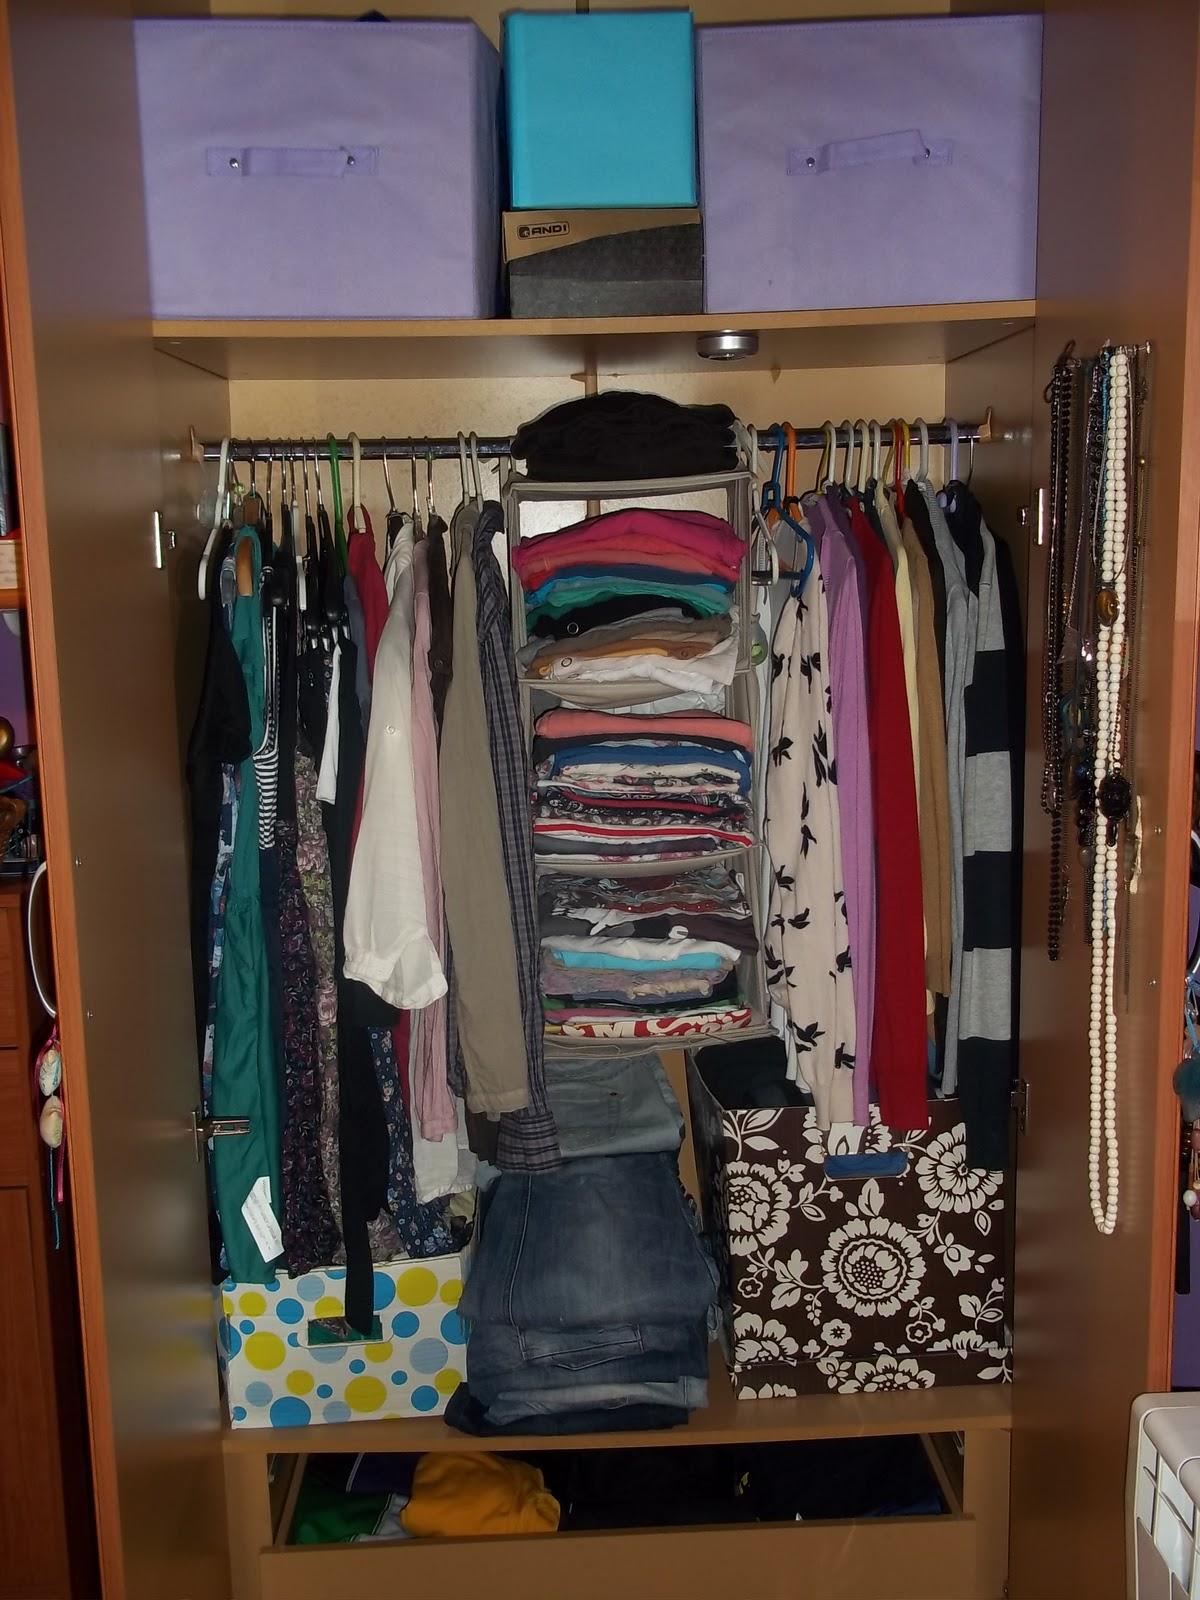 Everyday fashion beauty closet organization - Como organizar armarios ...